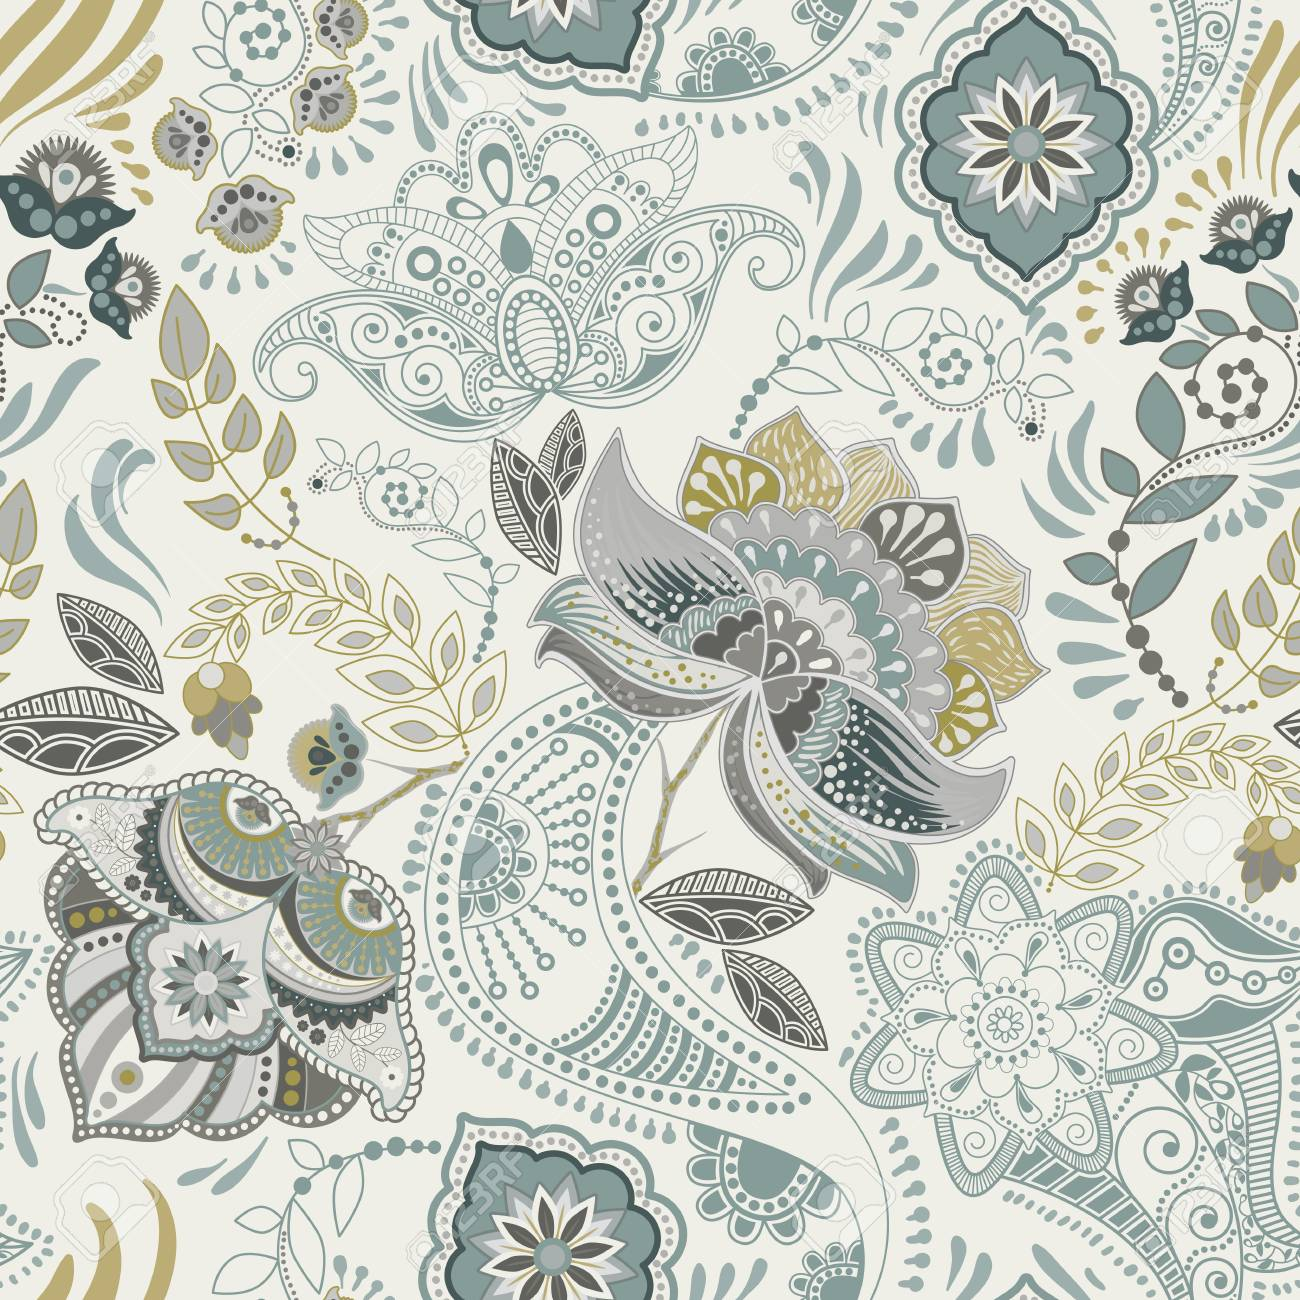 Floral vintage seamless pattern. Retro plants style. Paisley motif. Colorful damask ornament - 94567273